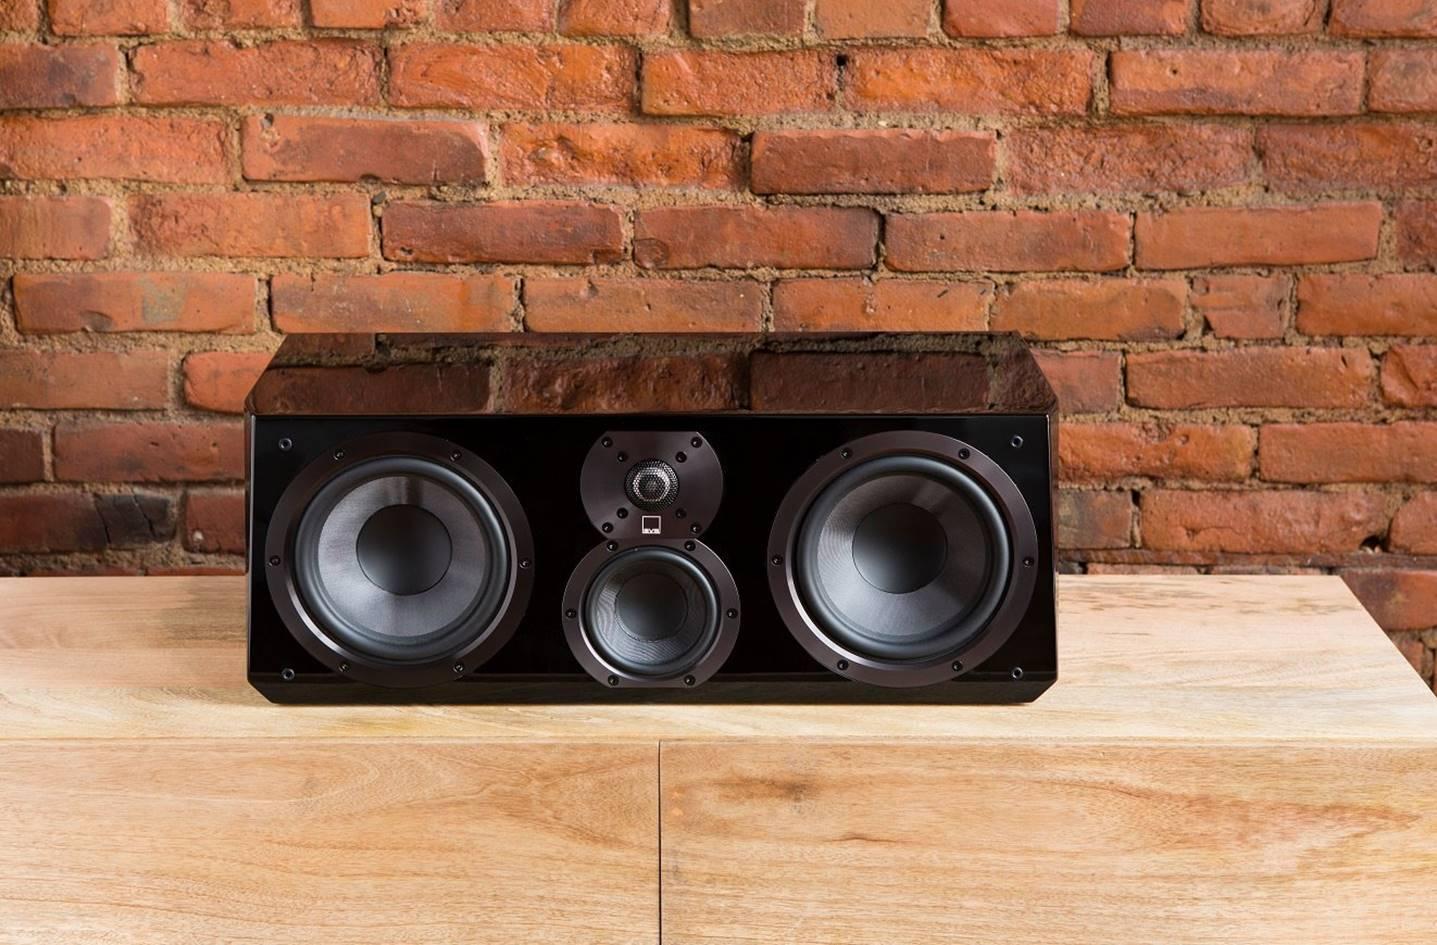 Top 8 Best Center Channel Speakers in 8 – Bass Head Speakers